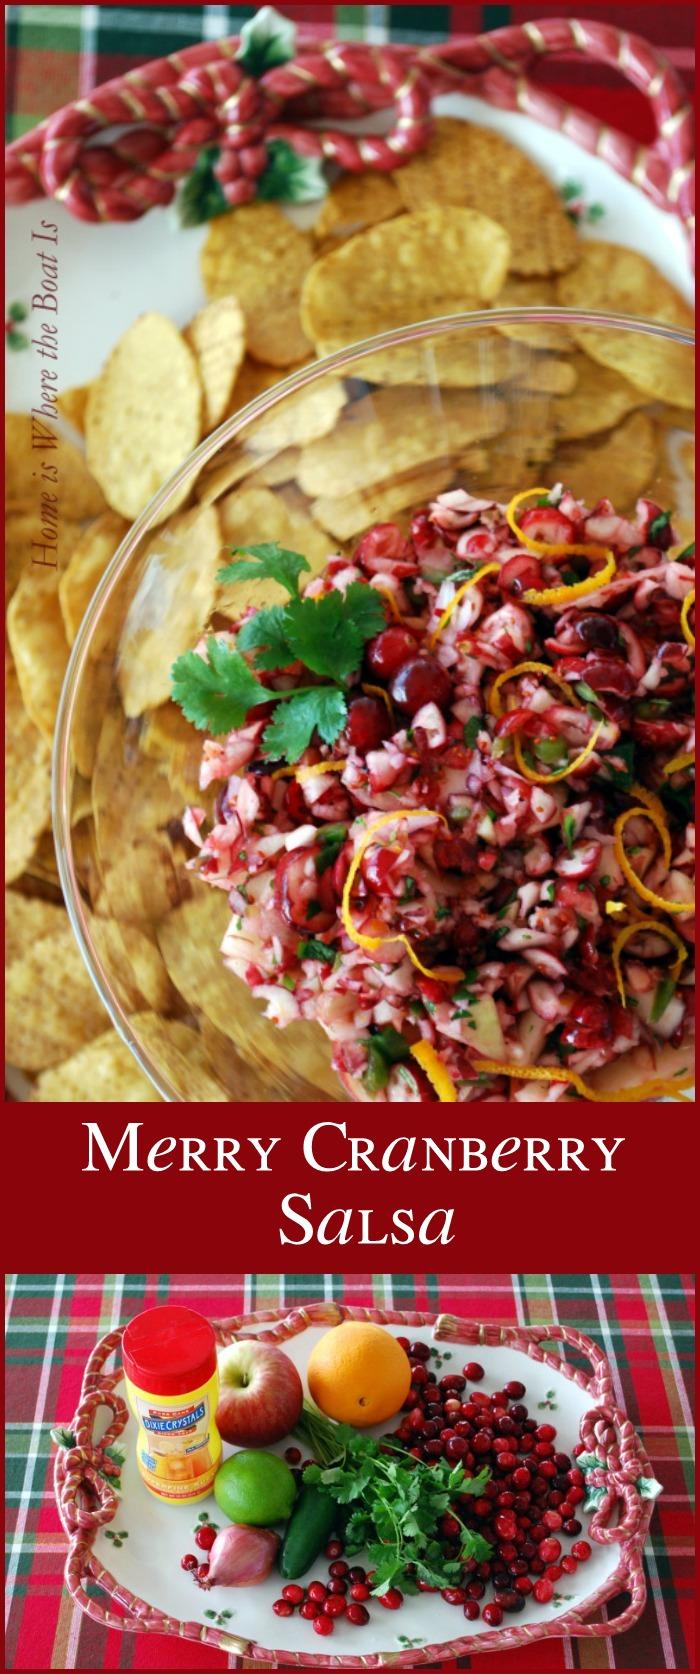 Merry Cranberry Salsa